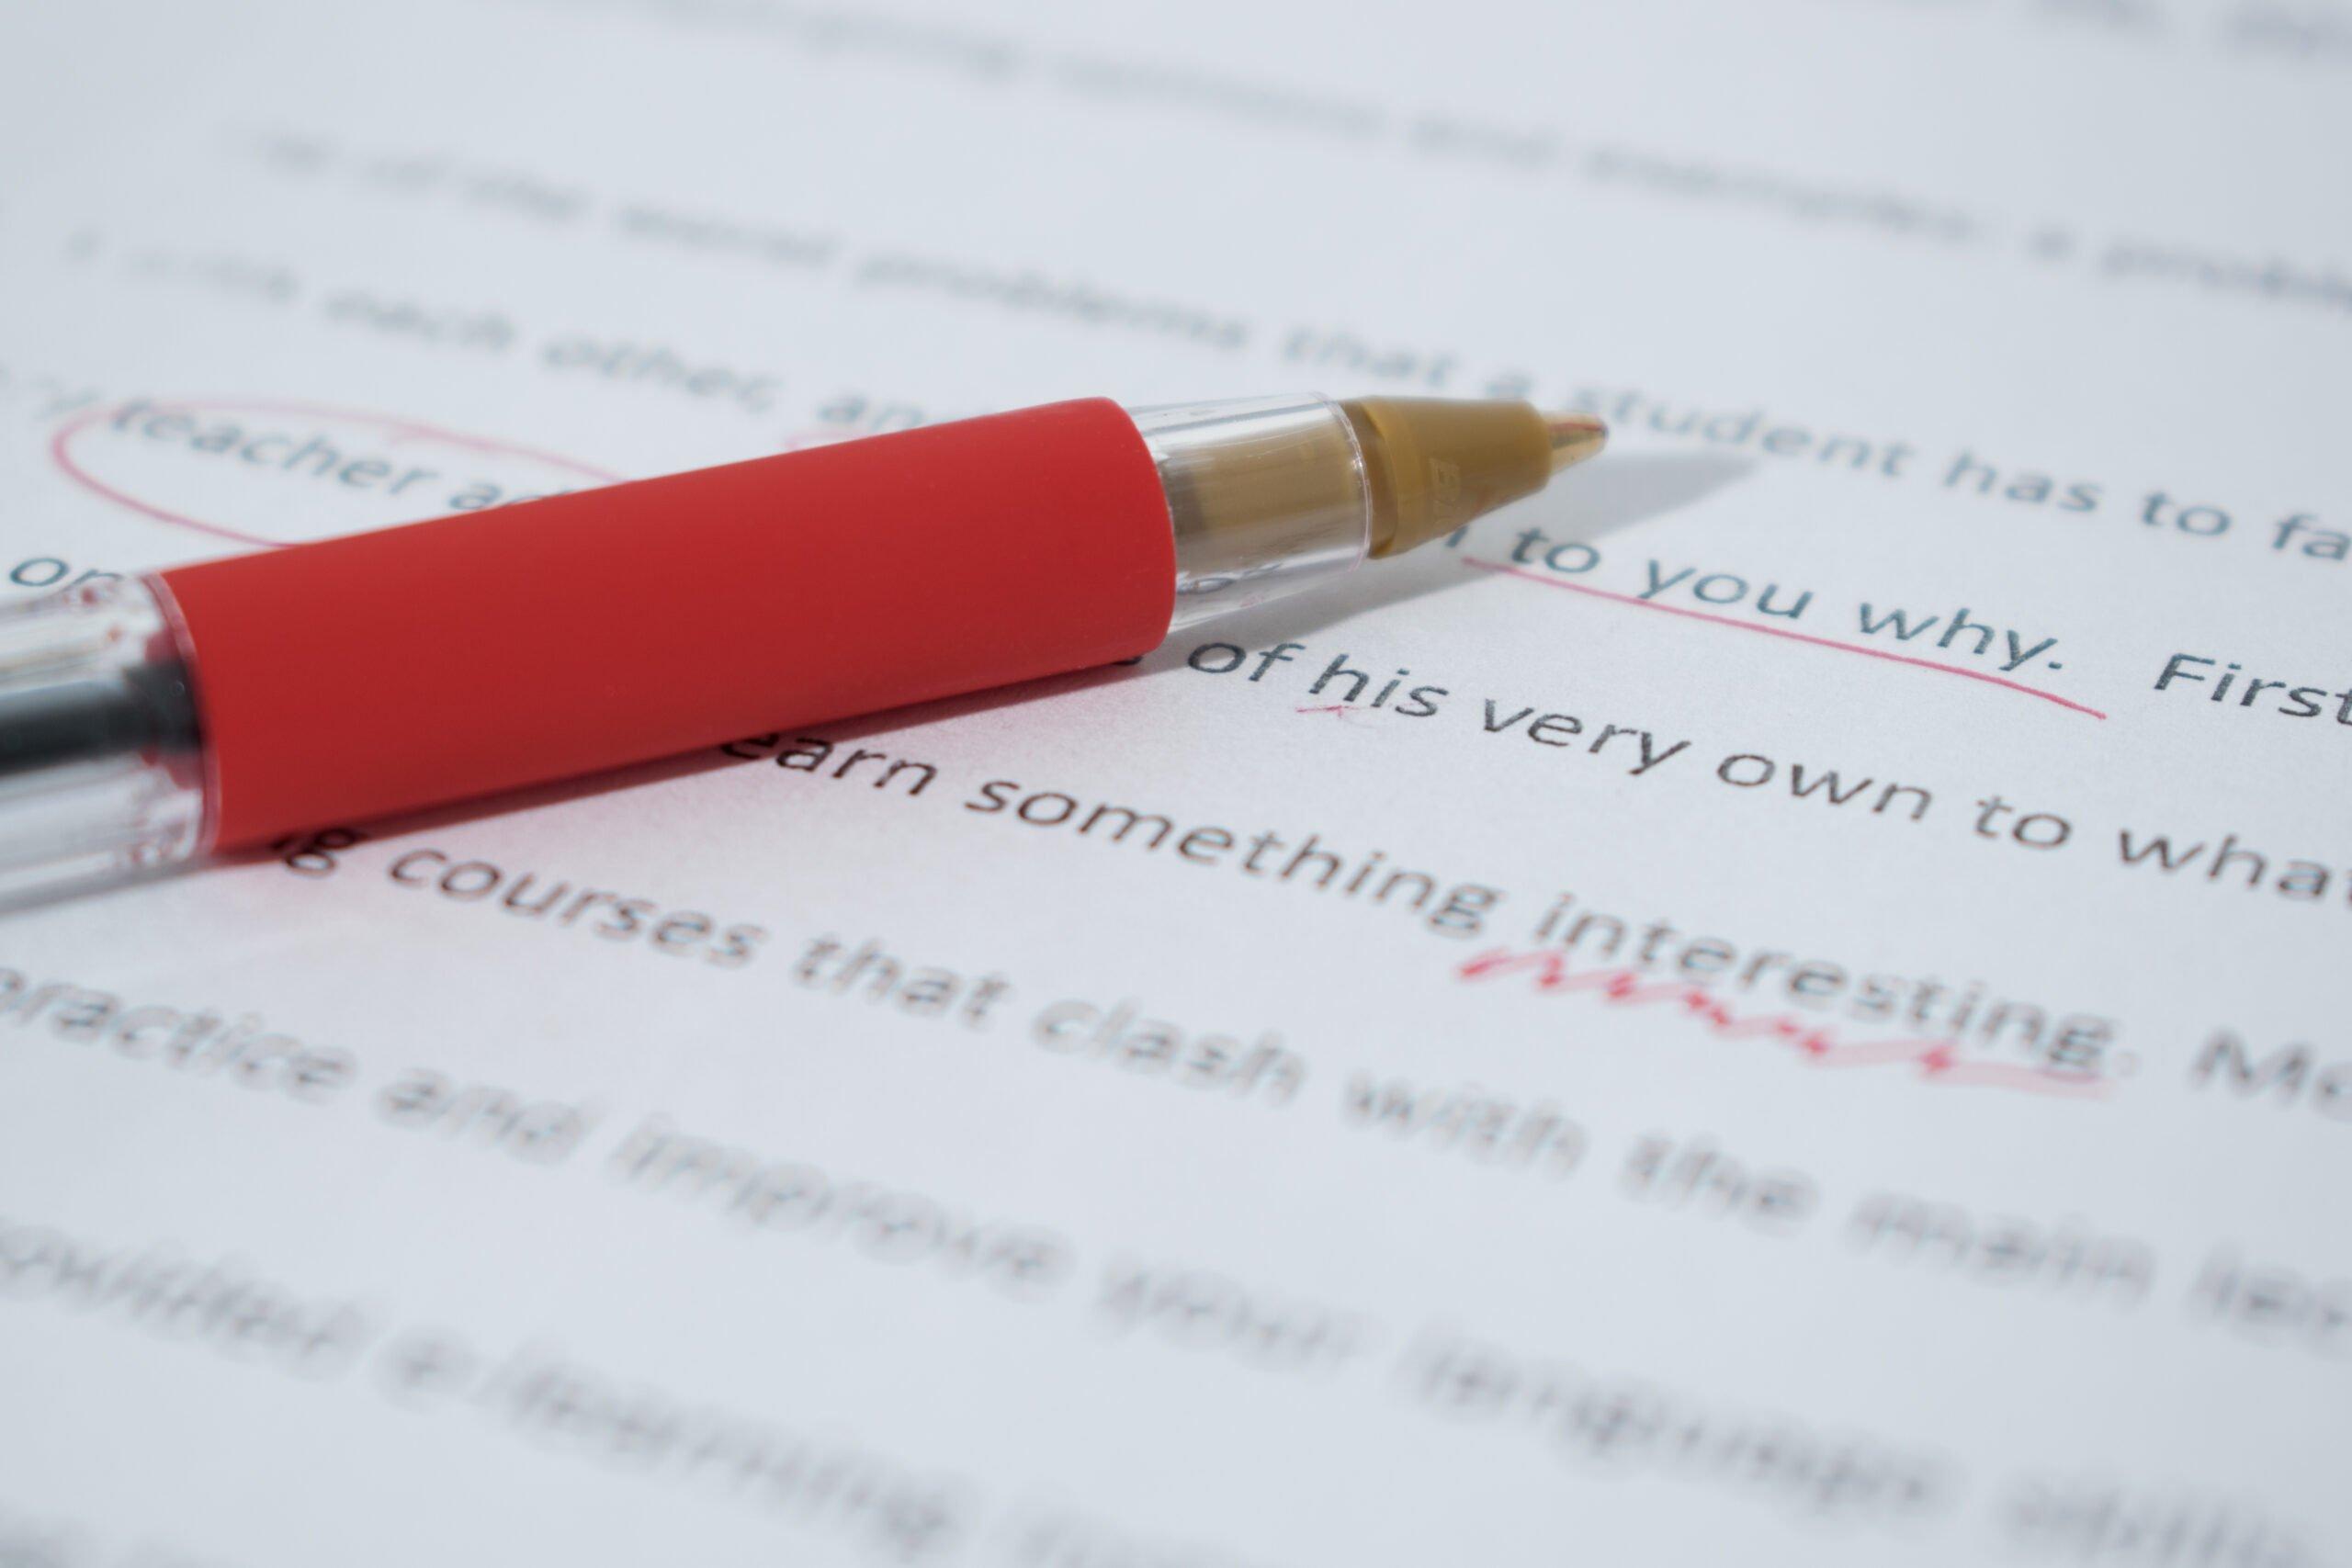 Canva-Correcting-Proof-Paper-Correction-Correct-Mistake